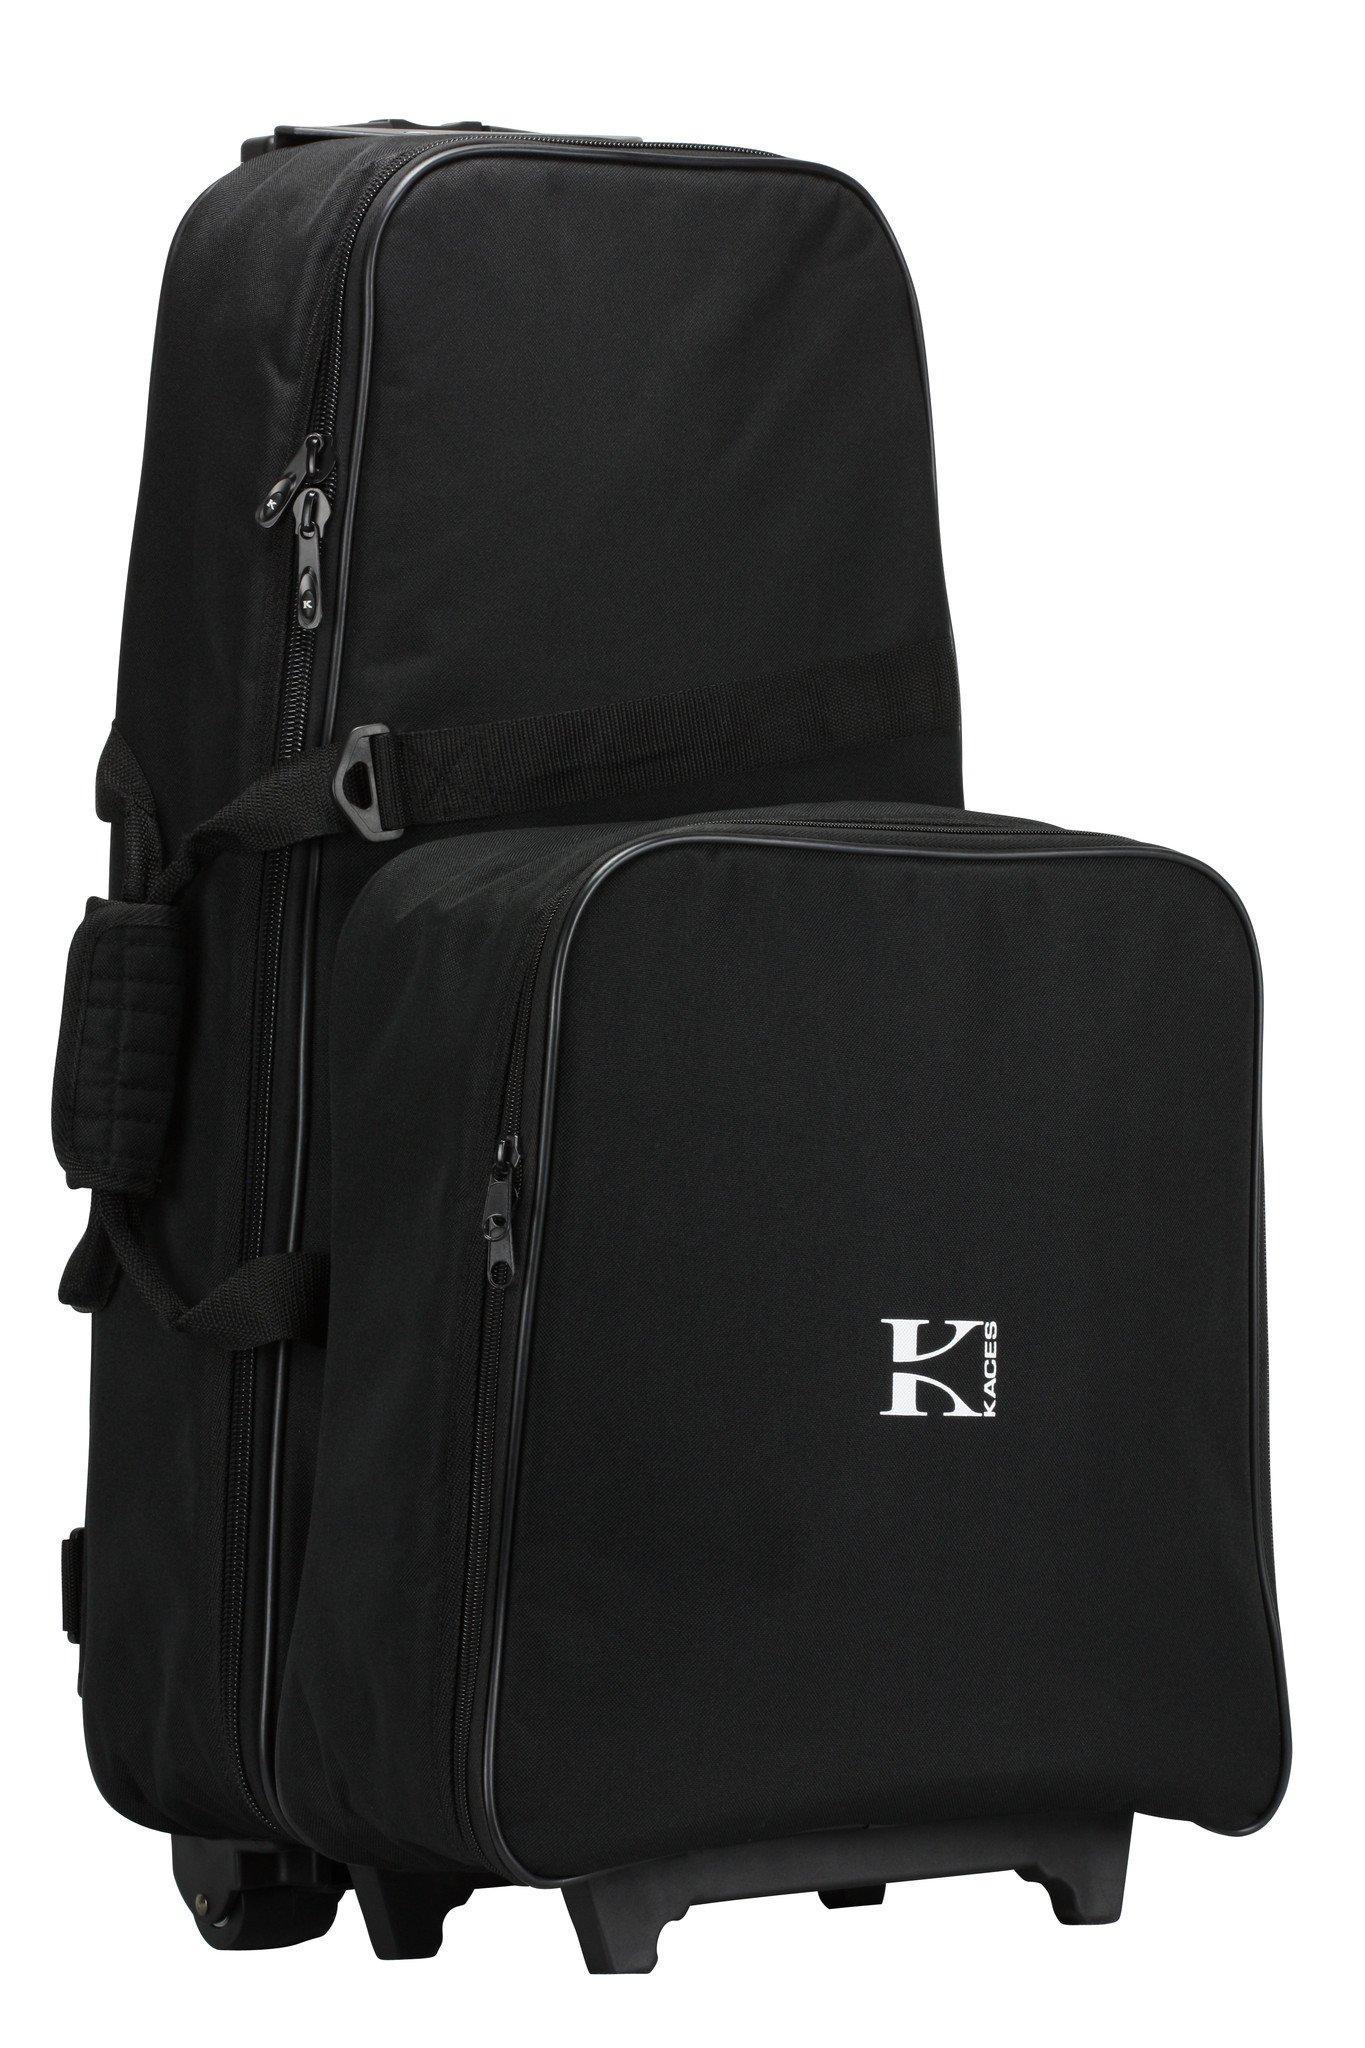 Snare/Bell Kit Duo Case w/Wheels